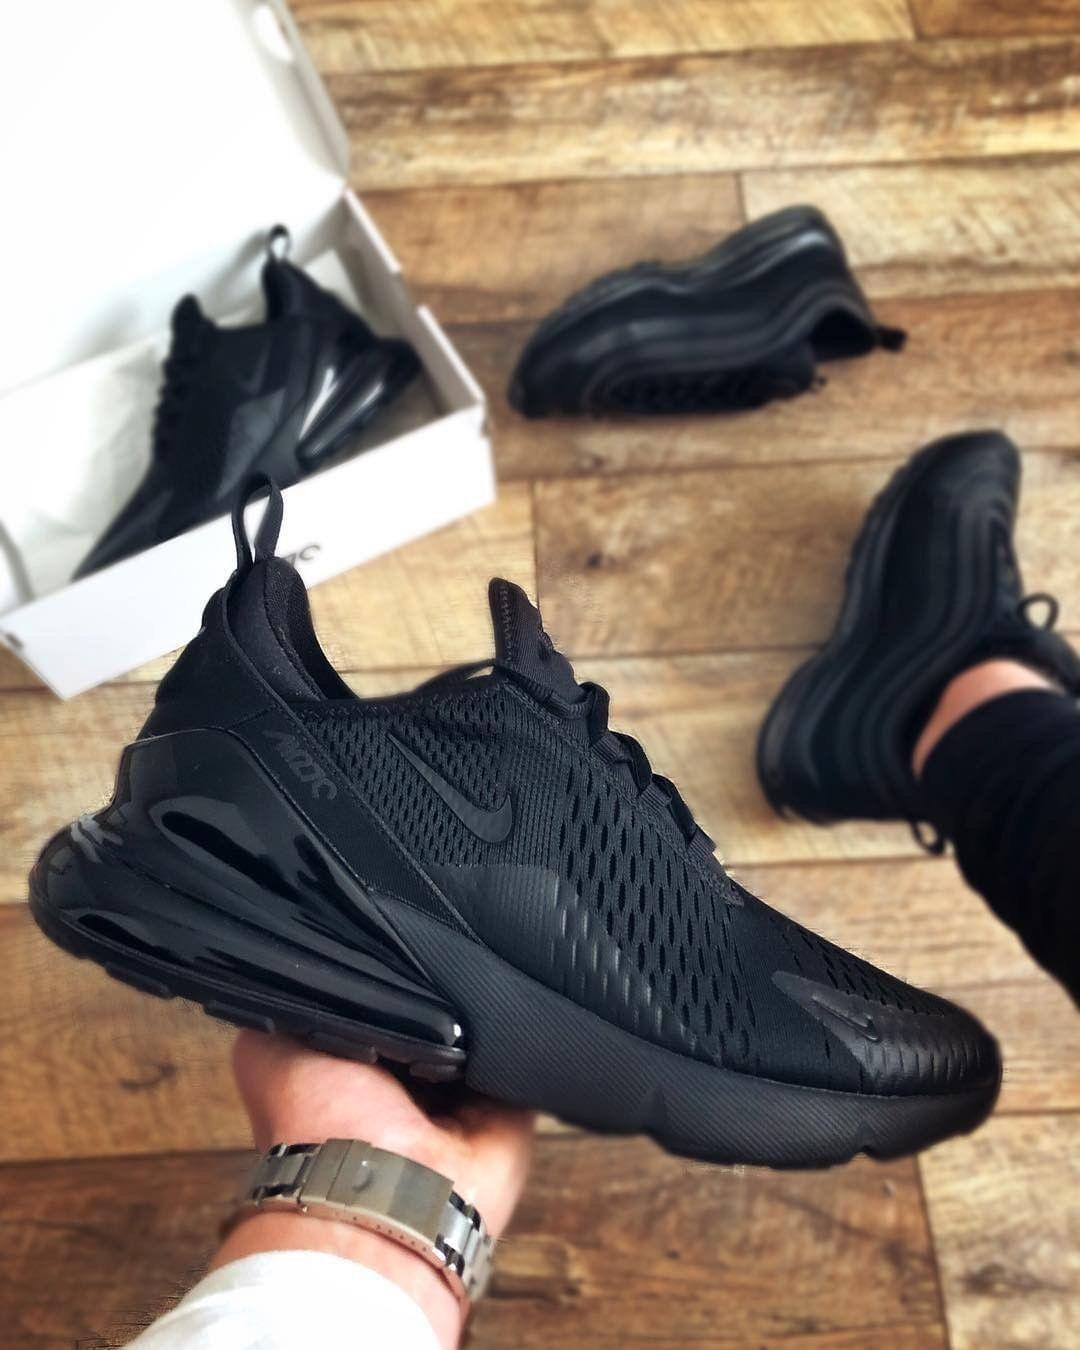 Nike Air Max 270 Sneakers in 2020 | Nike shoes women, Nike ...